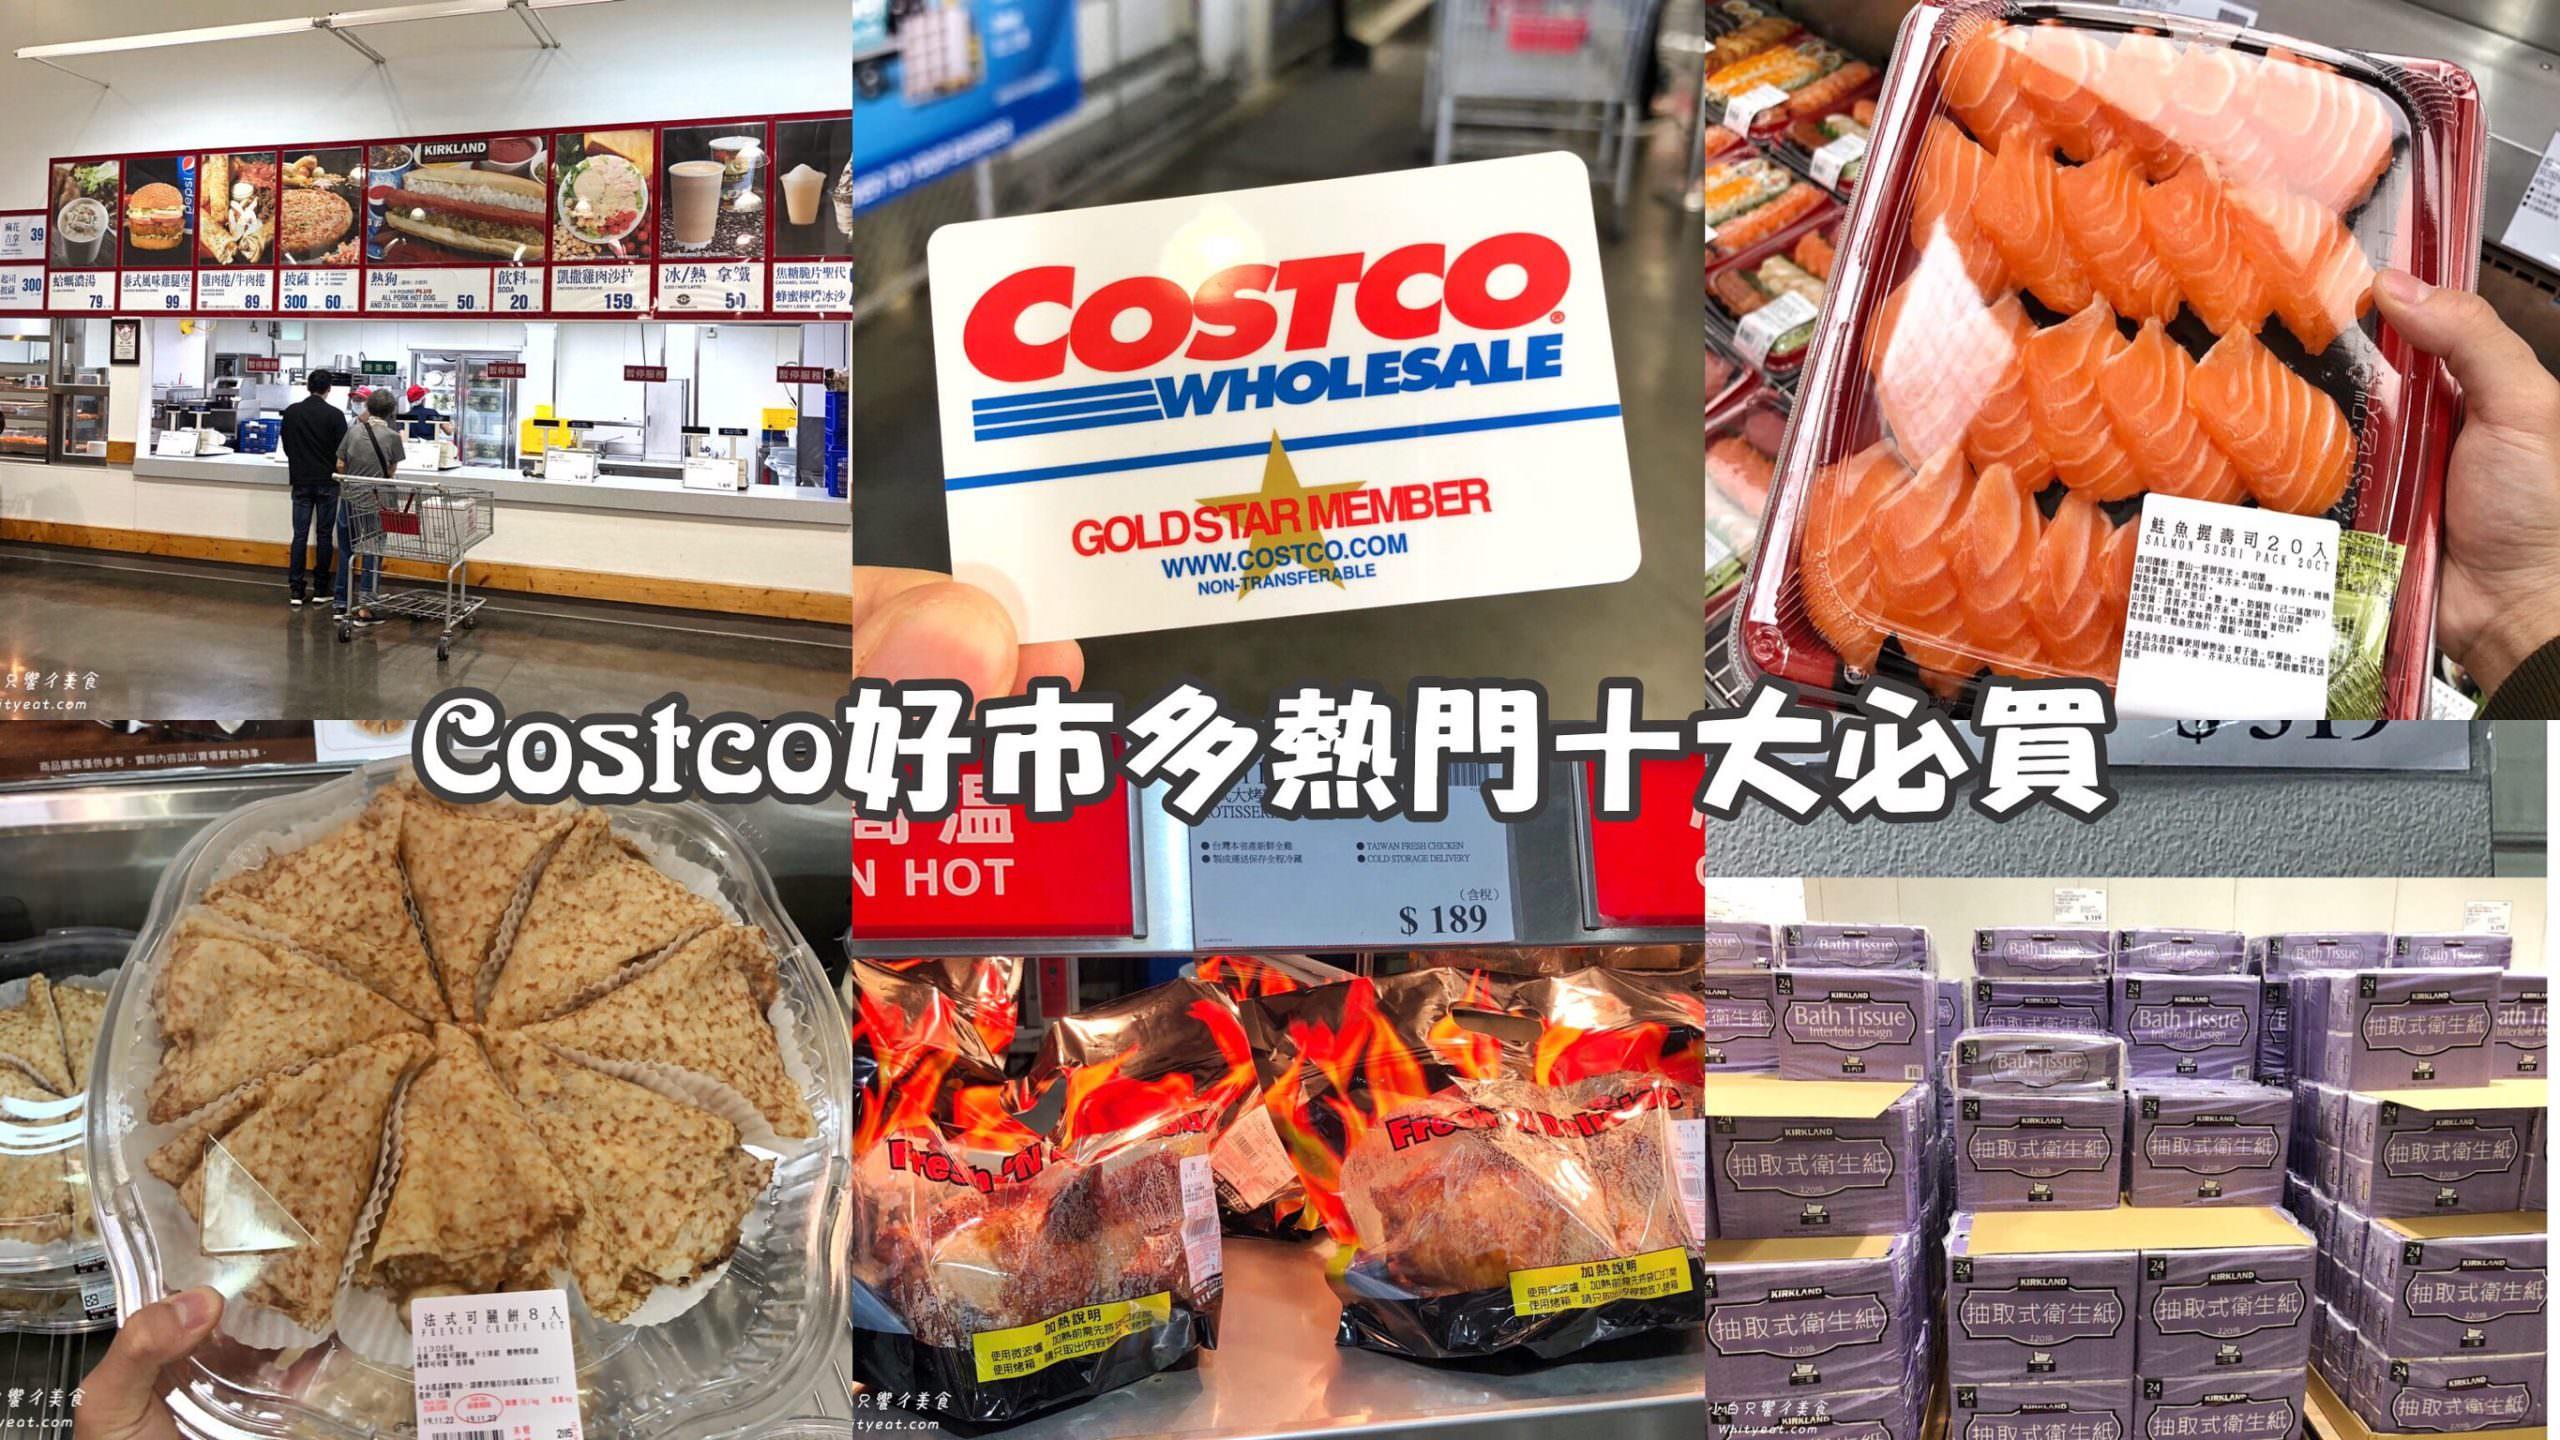 Costco好市多熱門必買名單有哪些?